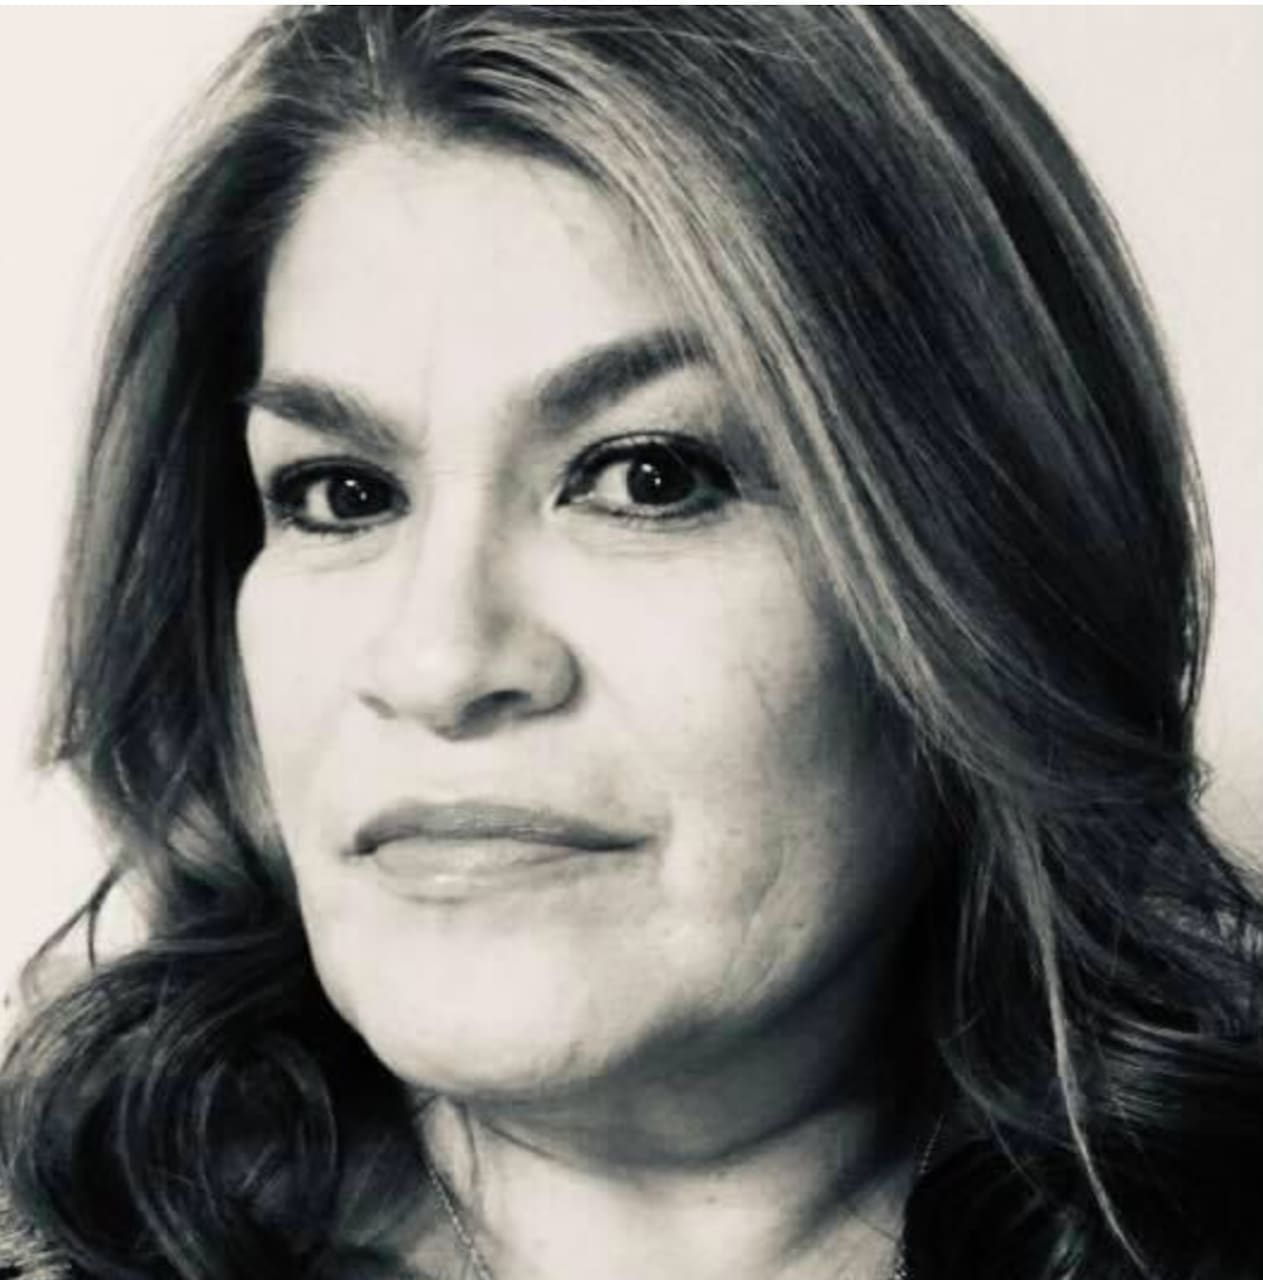 María Antonieta Soroa died murdered in her home